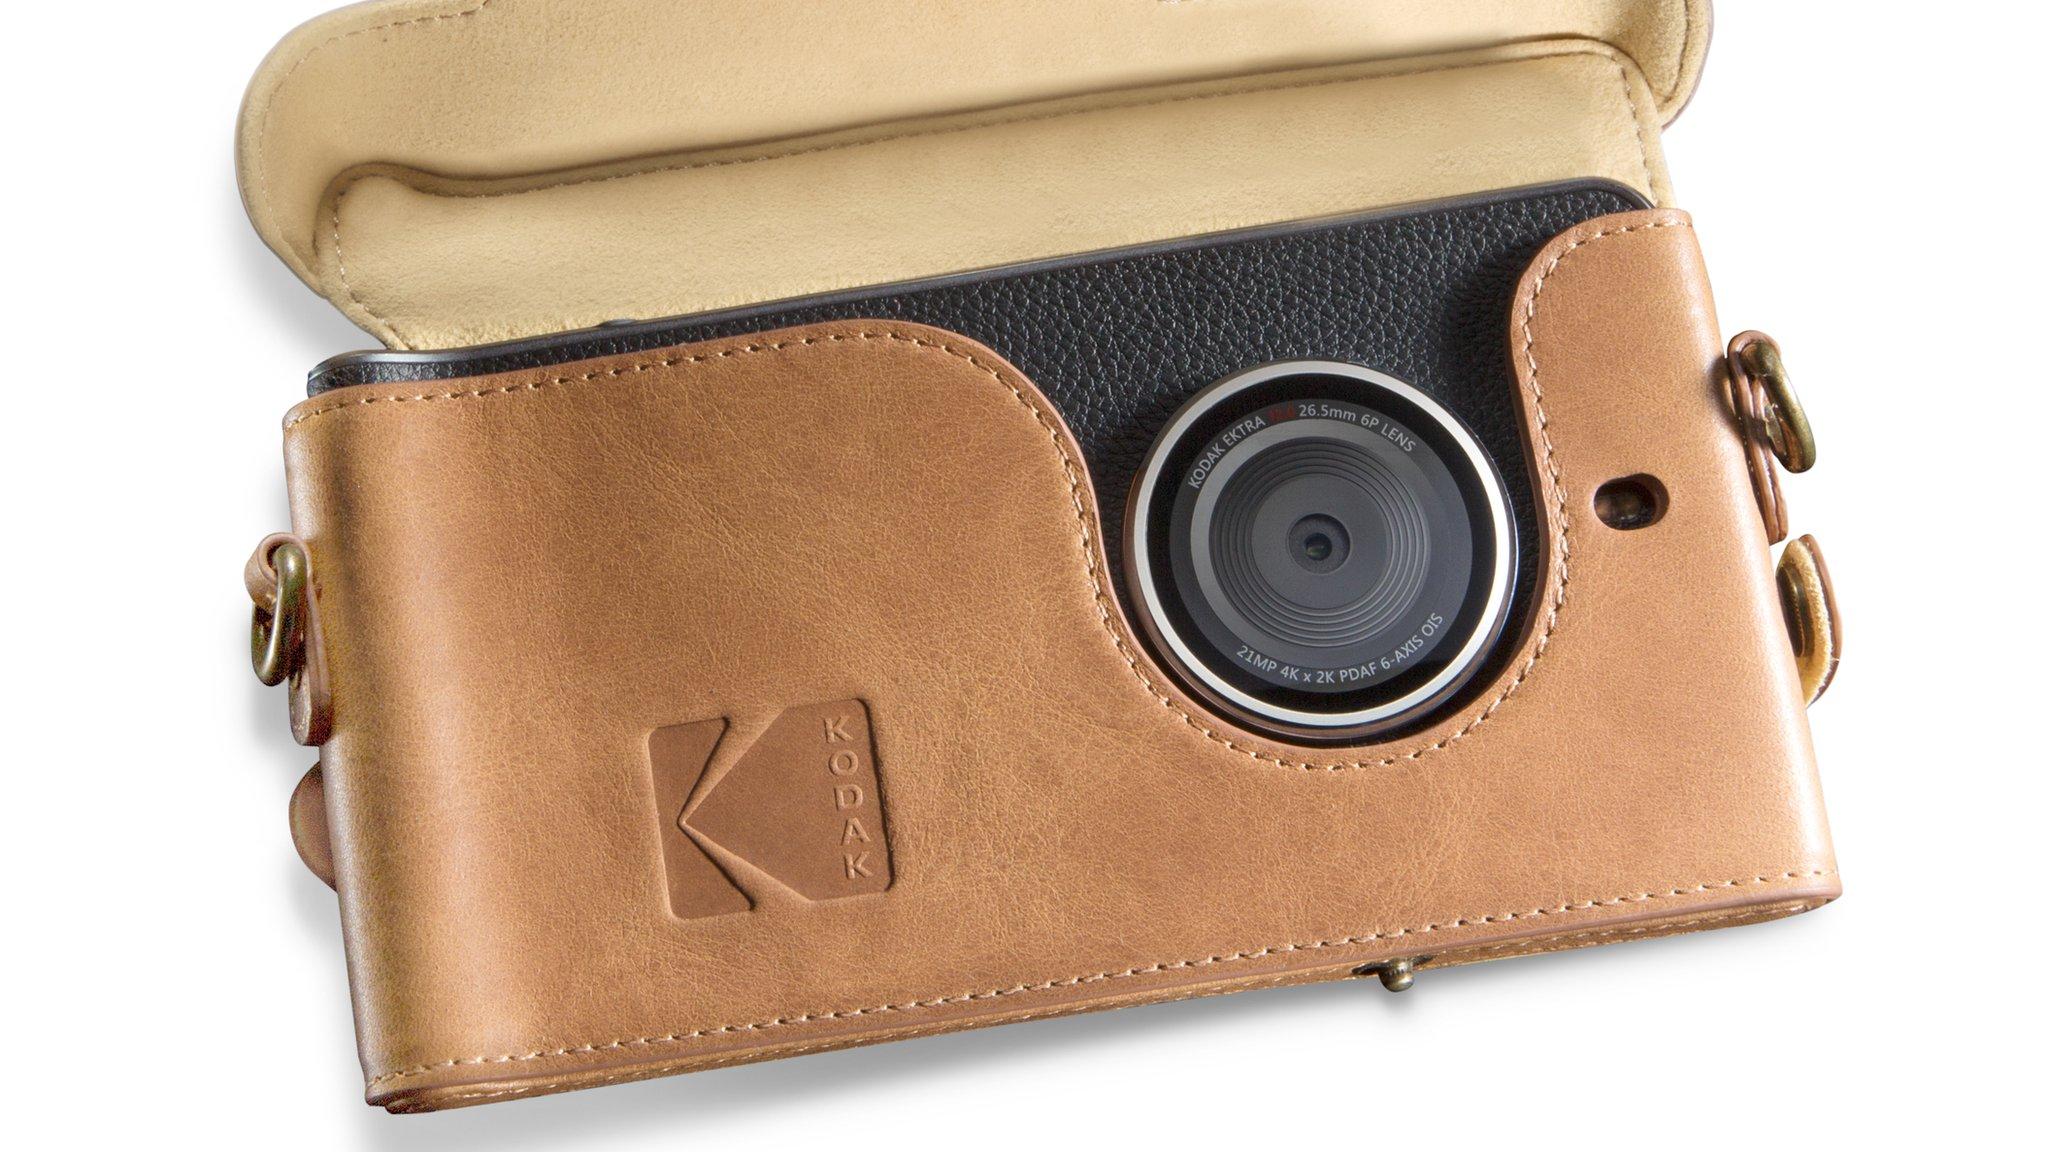 Kodak Ektra smartphone inspired by 1940s